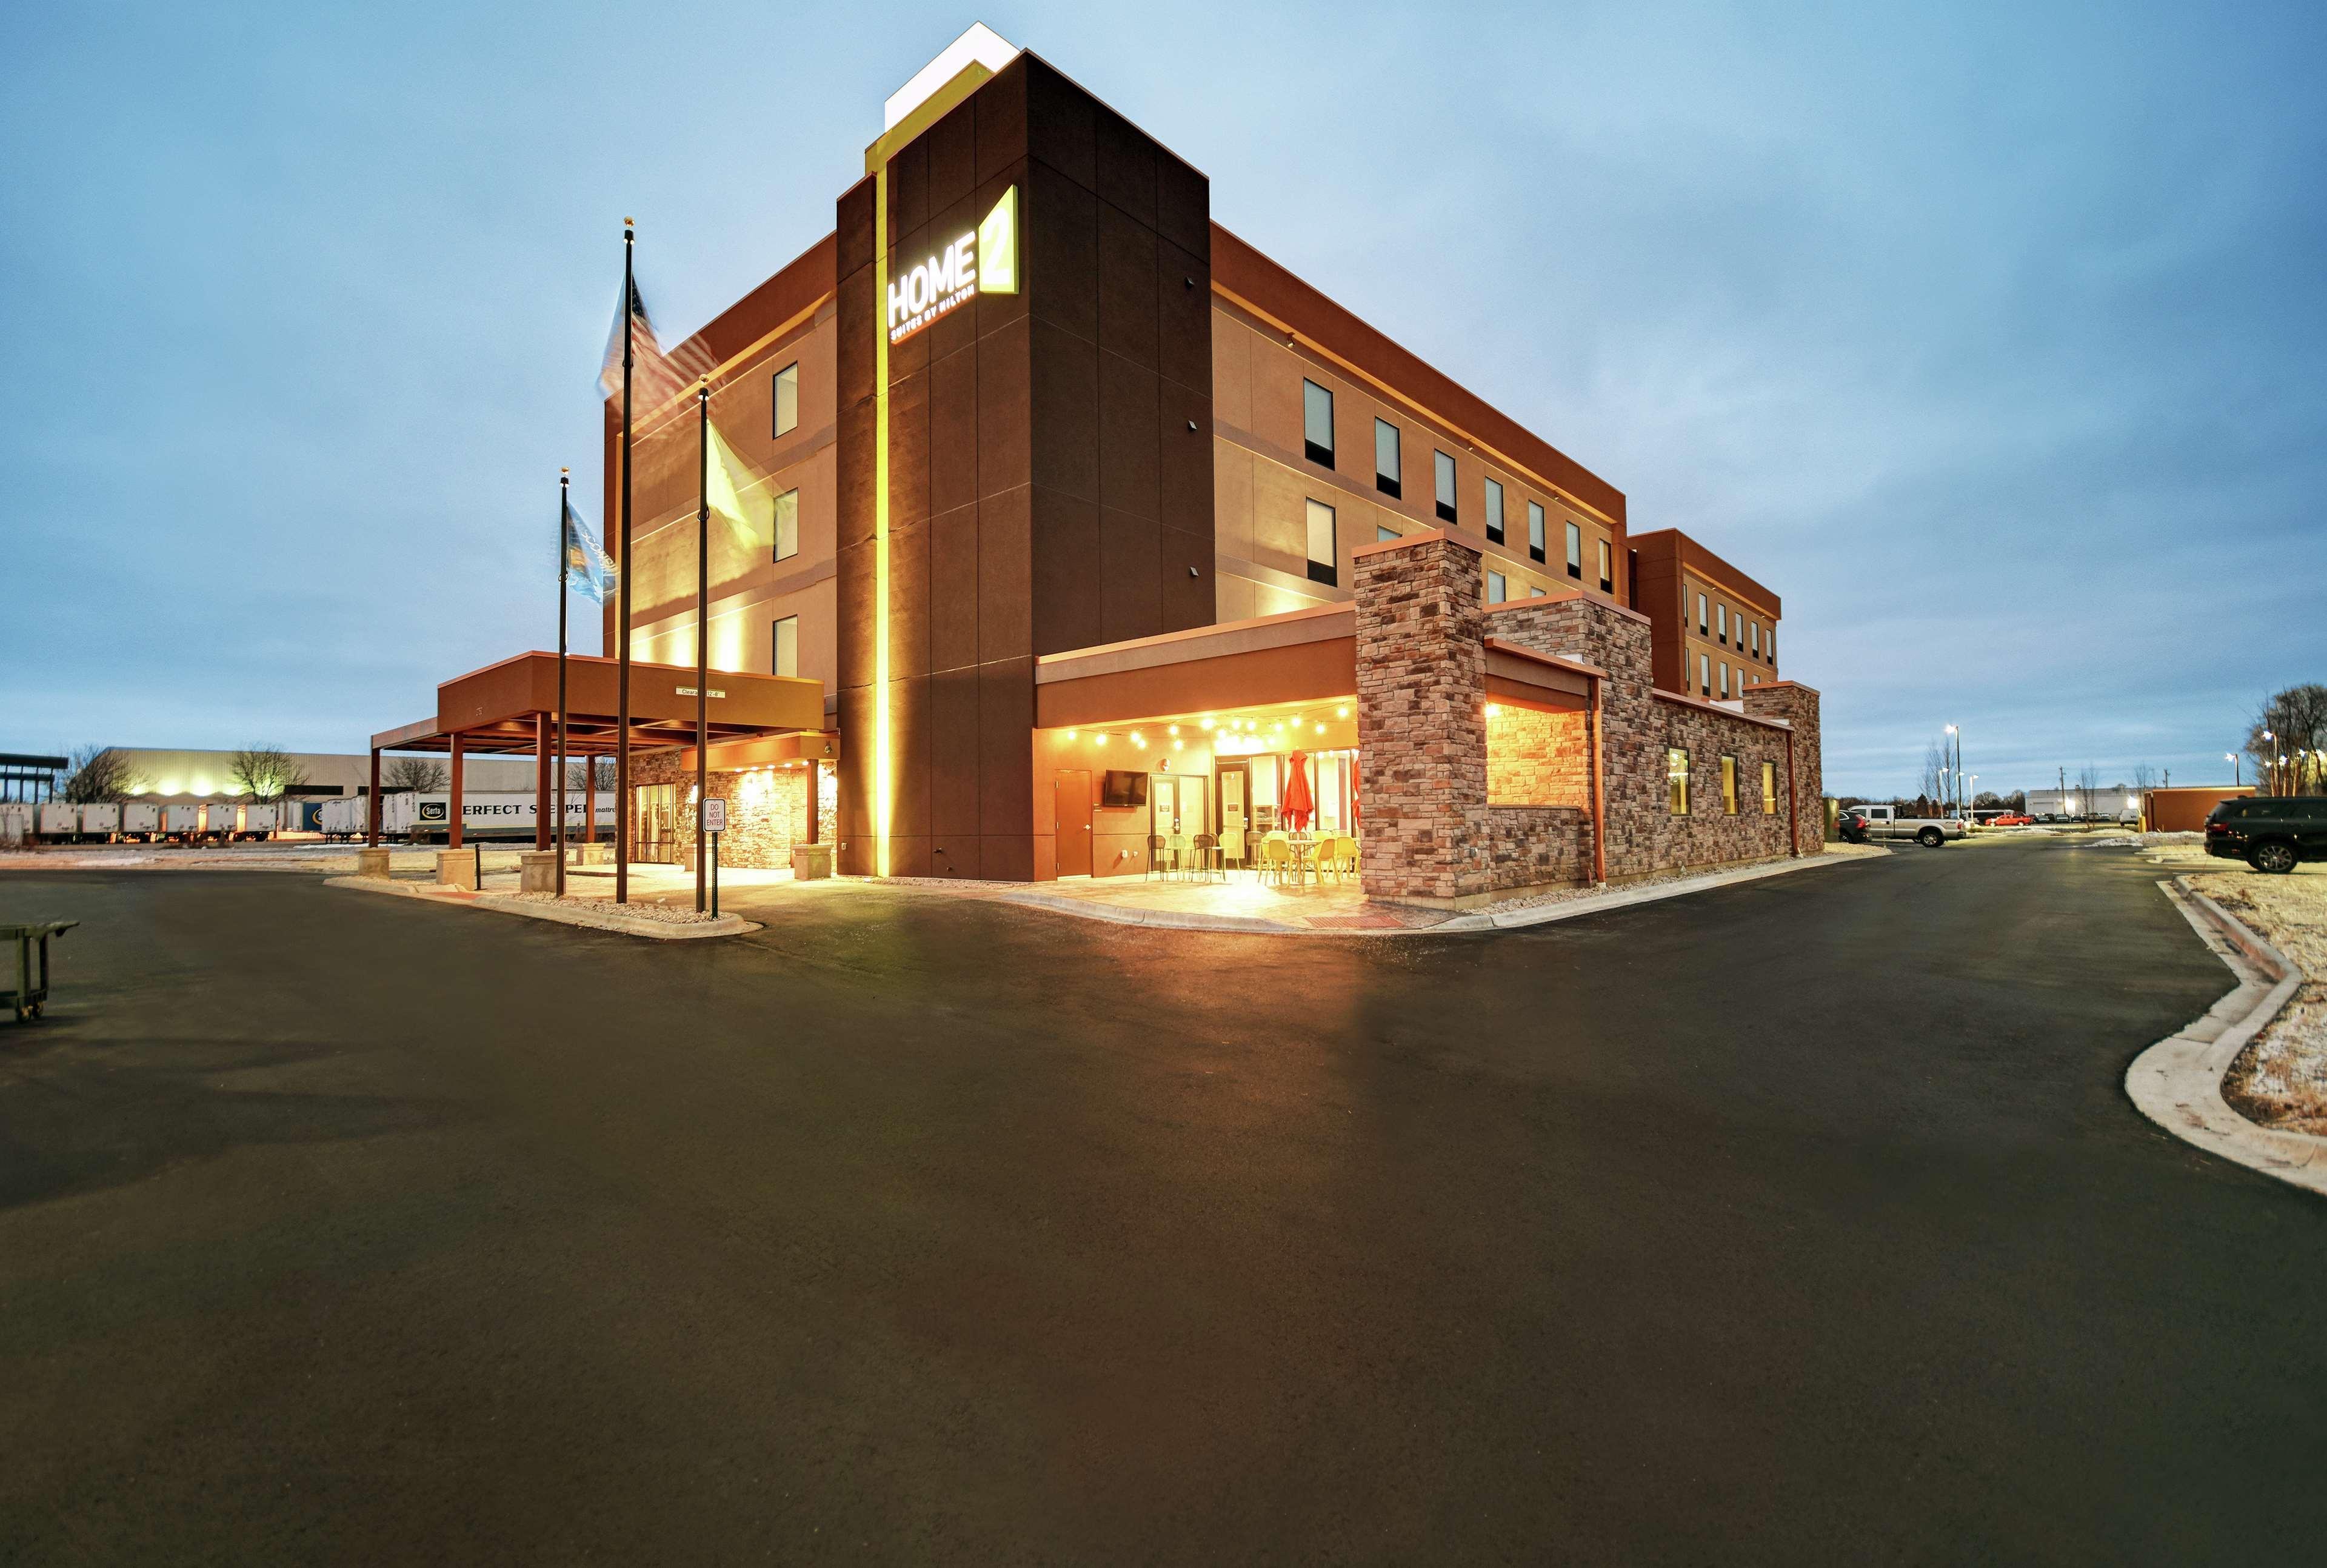 Home2 Suites by Hilton Reno, NV, Rock